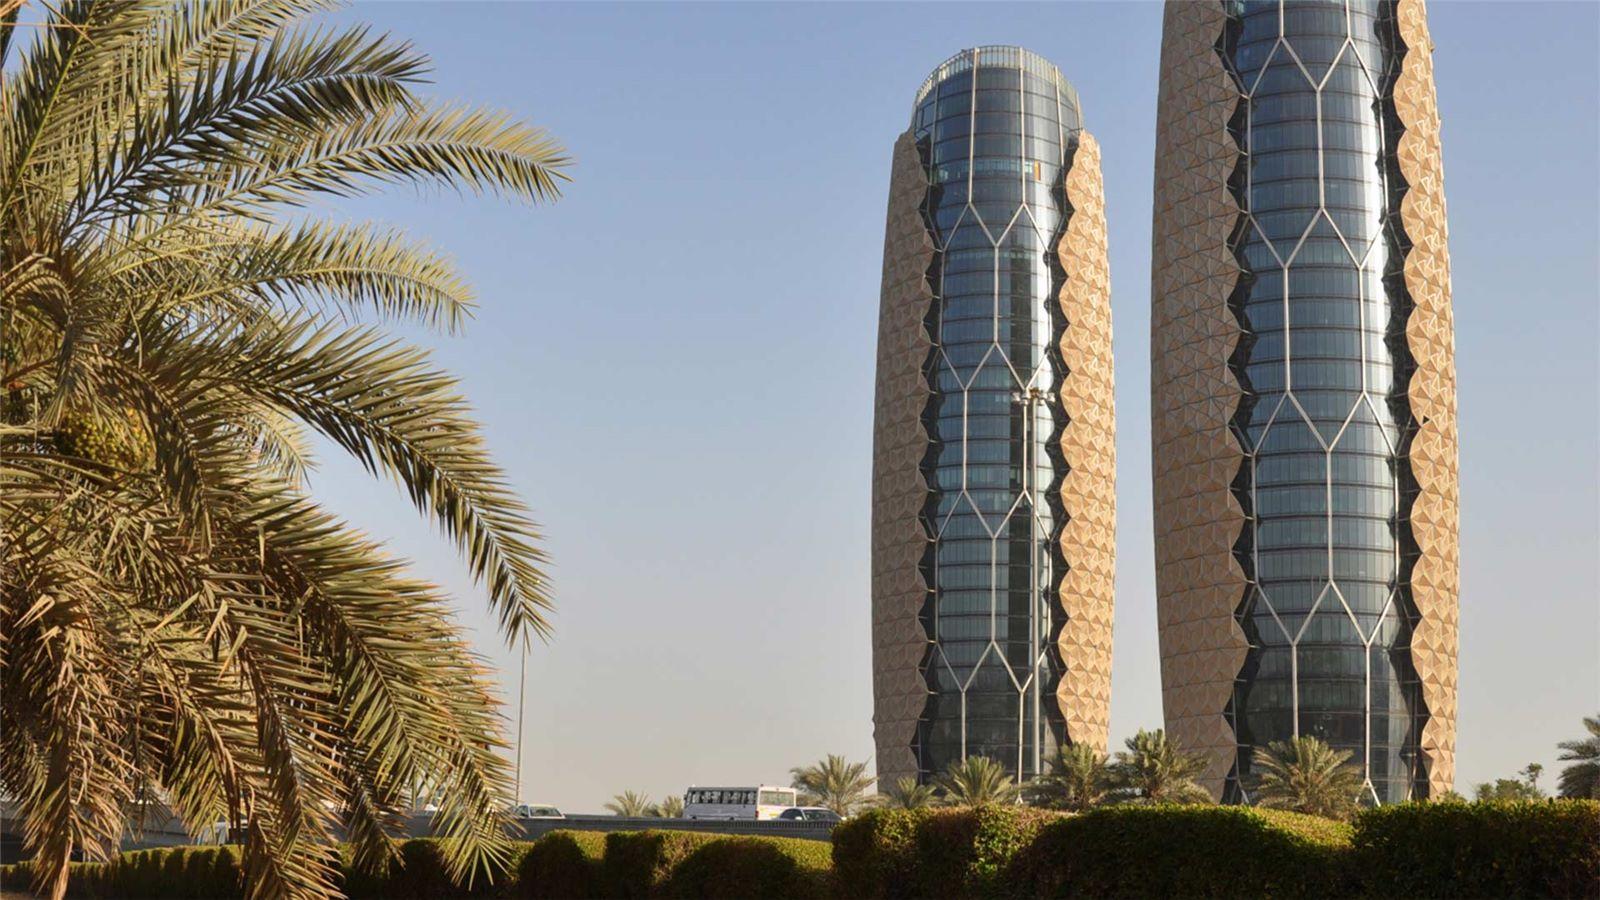 Al Hilal Bank, Al Bahr Towers, UAE - Mace Group